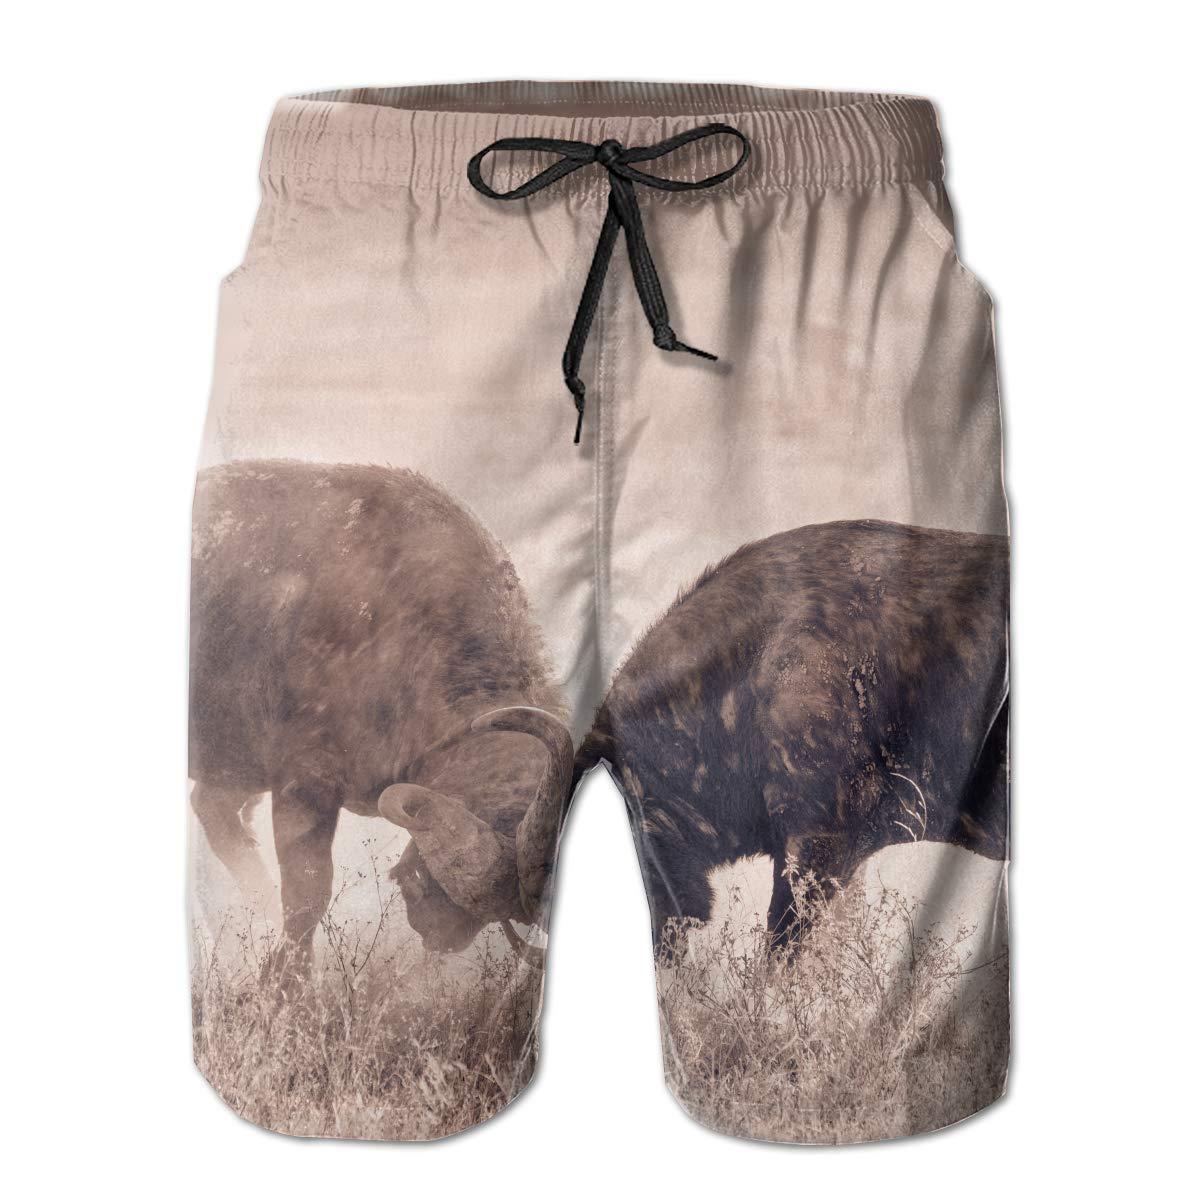 African Buffalo Fighting Mens Quick Dry Swim Trunks Beach Board Short Drawstring Casual Athletic Shorts